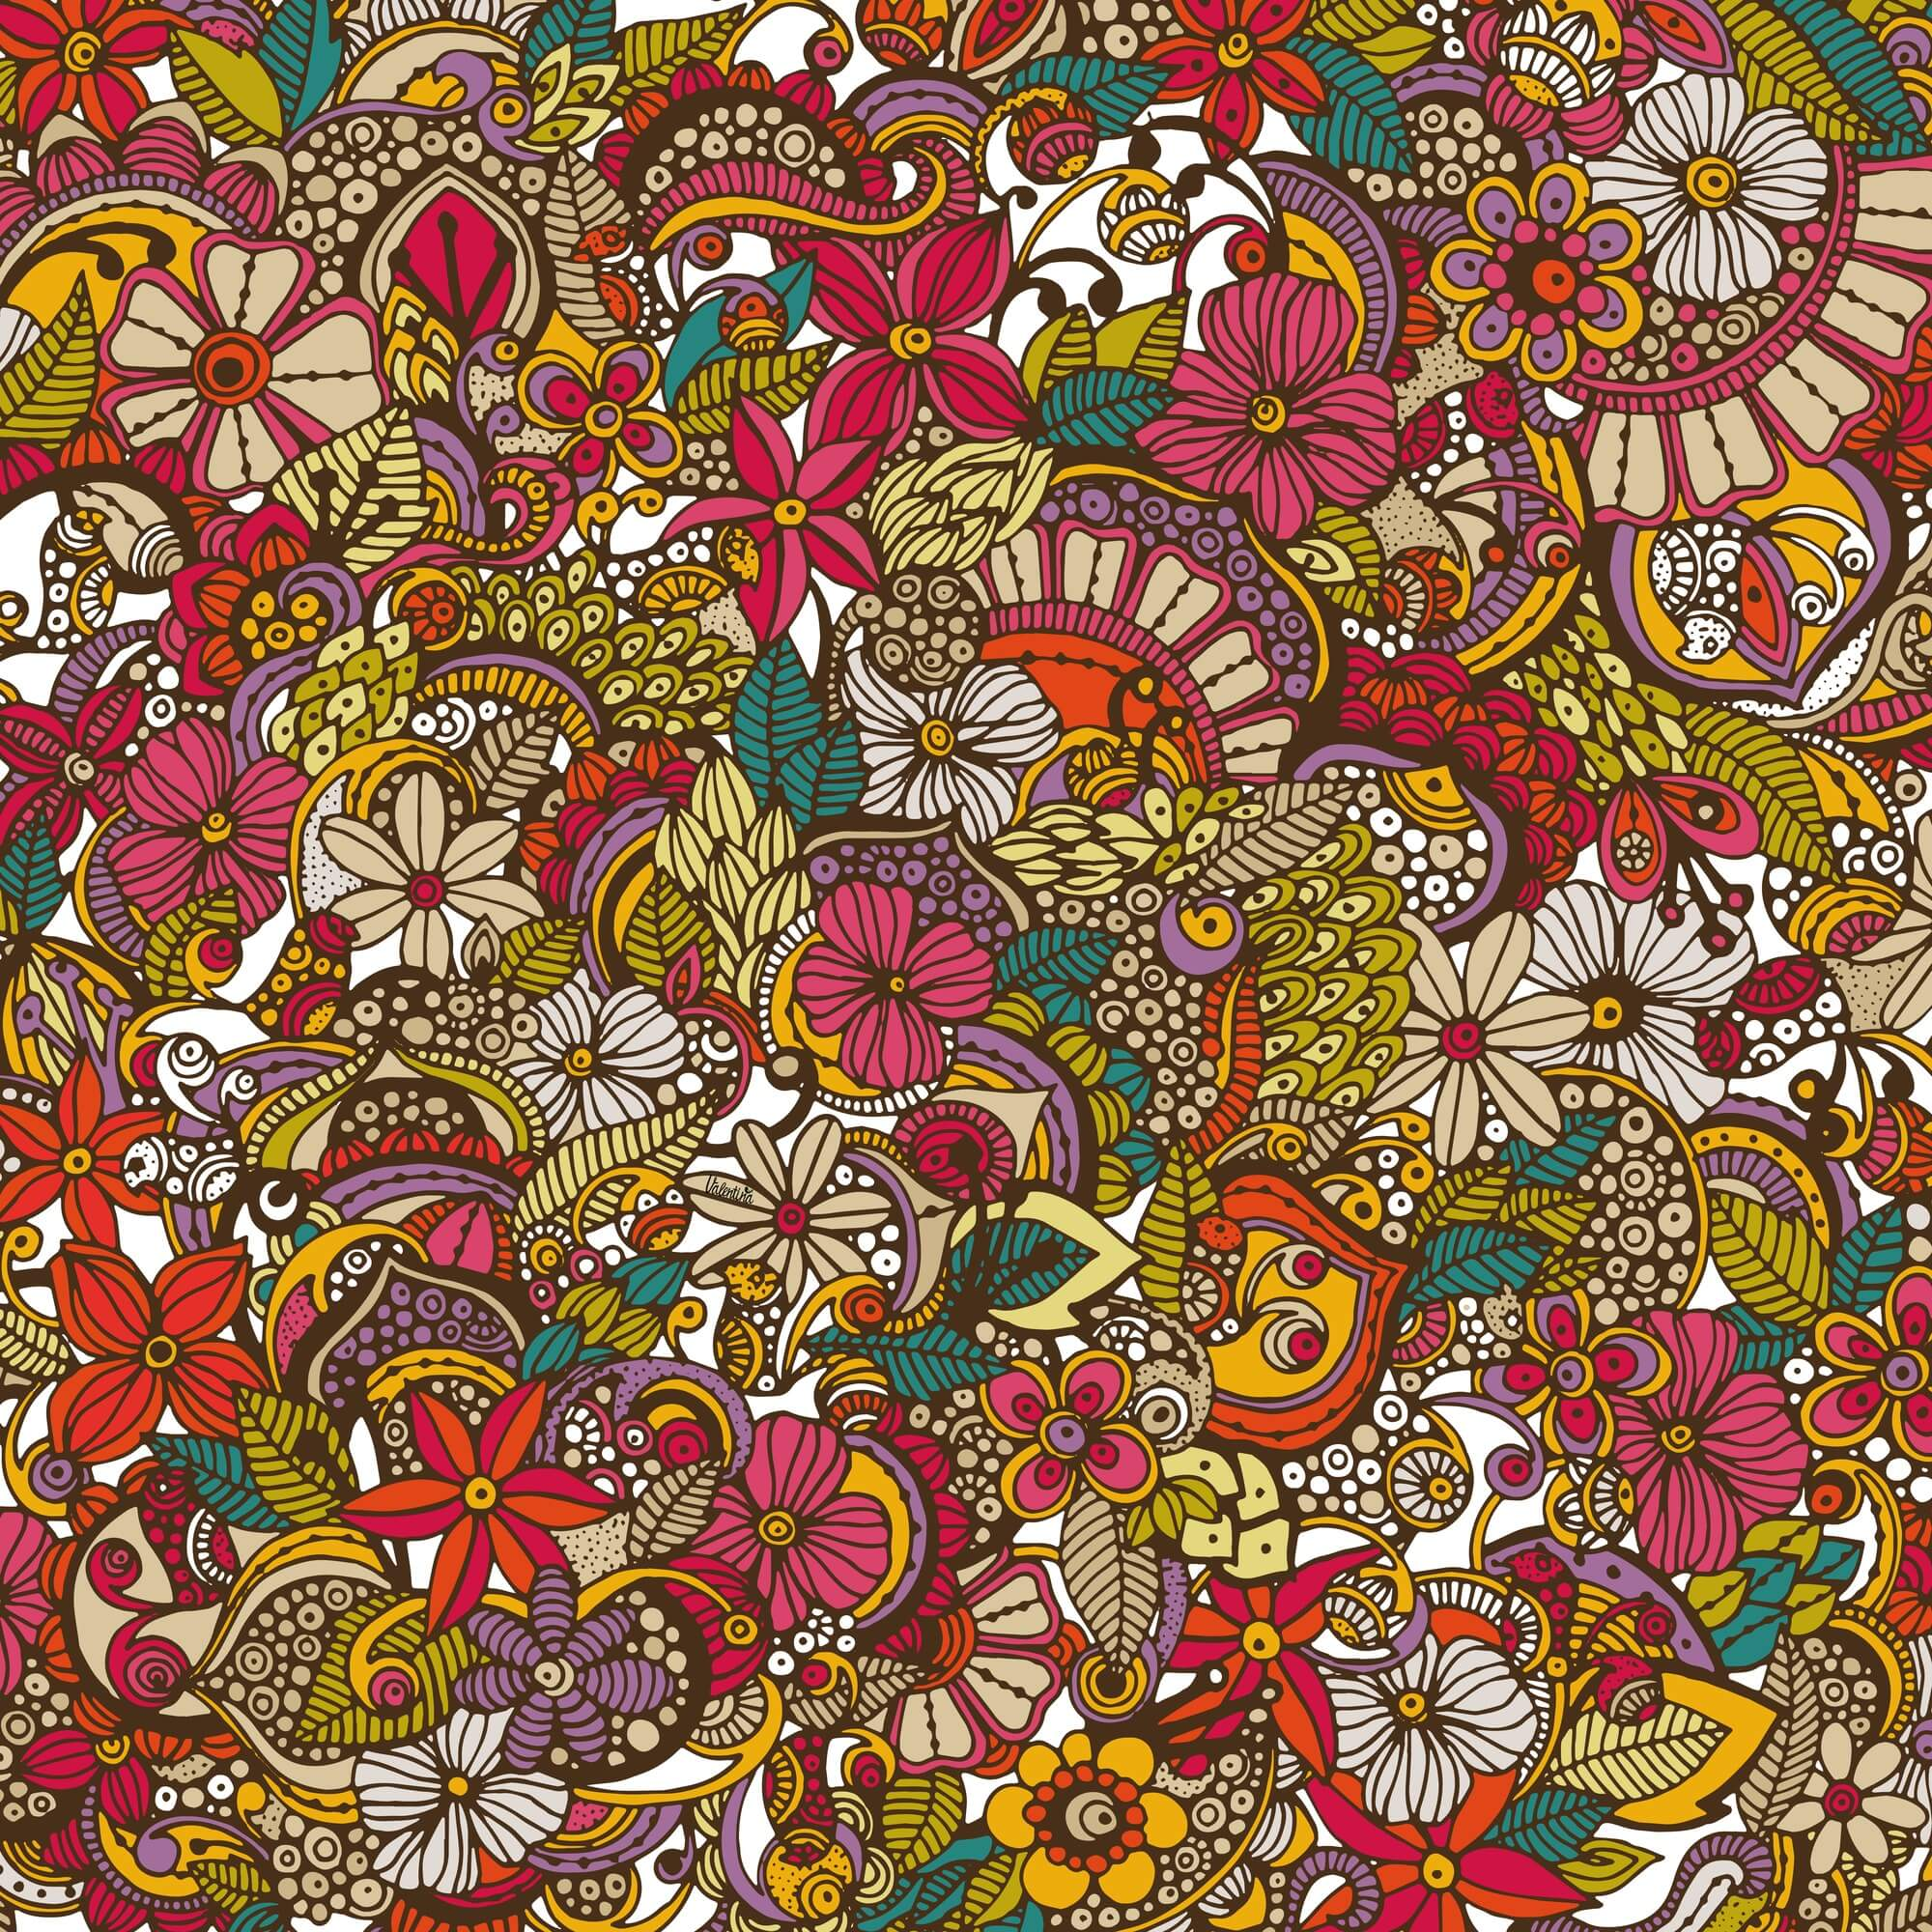 I Spy Colors mural wallpaper